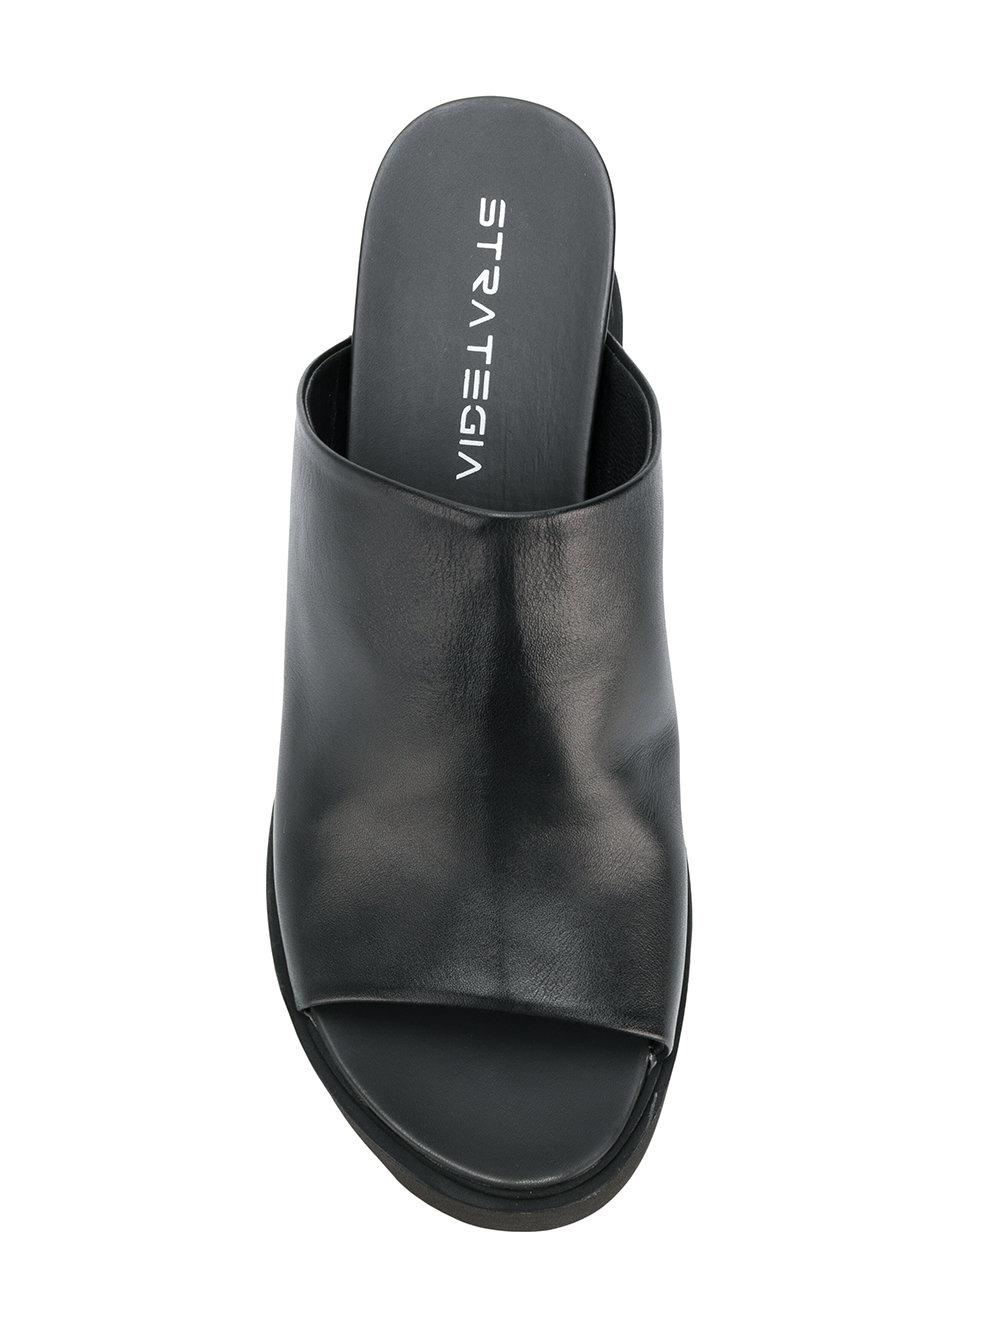 sling-back open-toe sandals - Black Strategia 62vi5